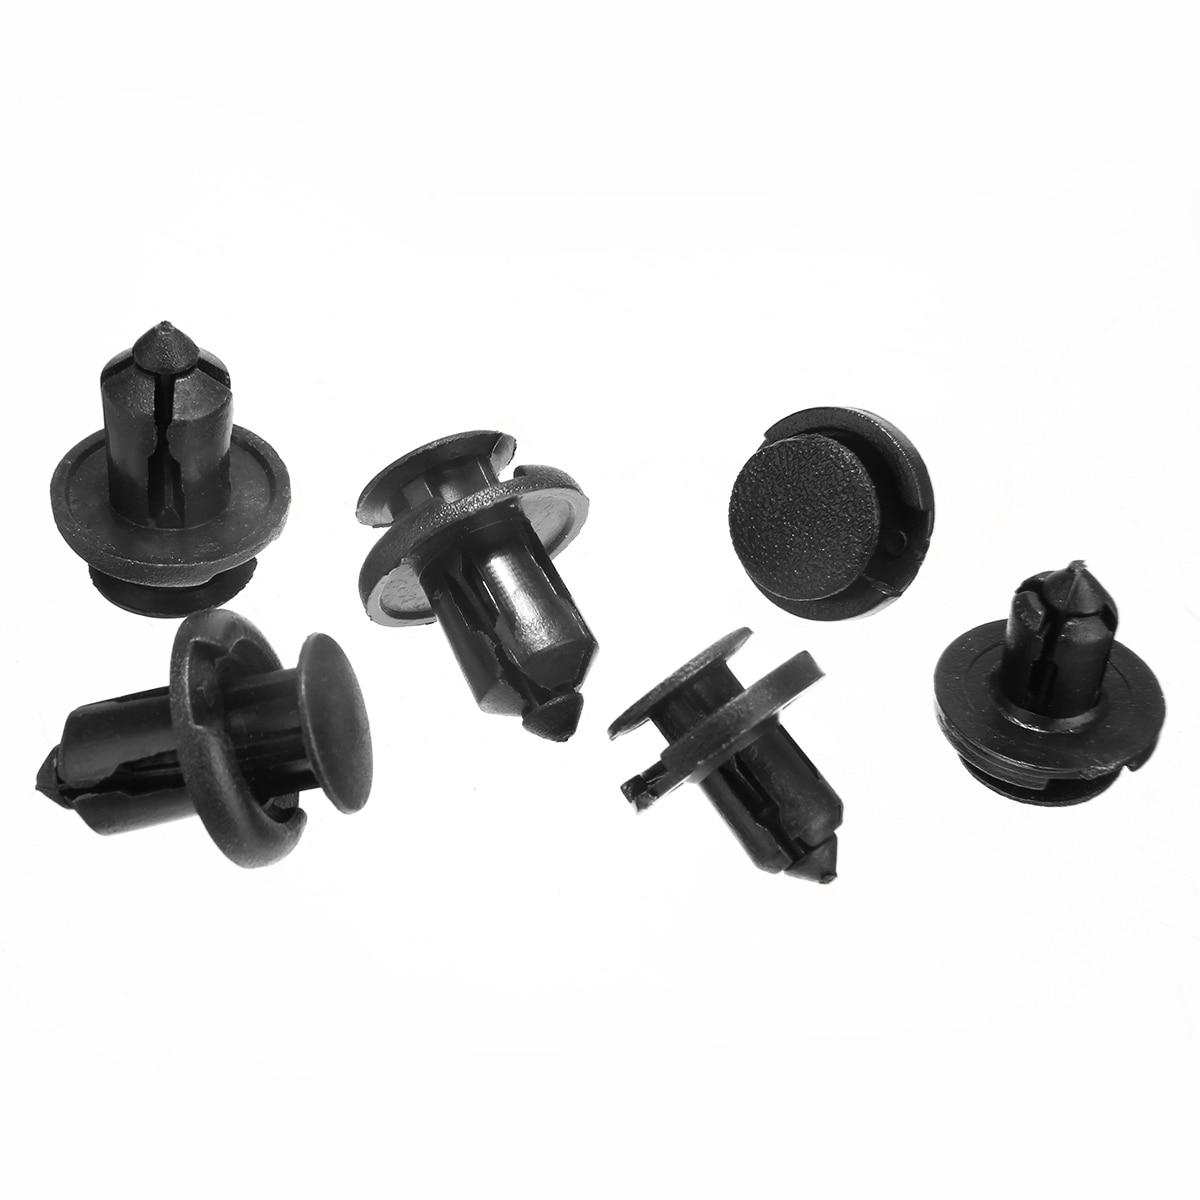 20x Plastic Retainer Bumper Rivet Trim Clip 8mm/&10mm Kit For Honda Civic Accord